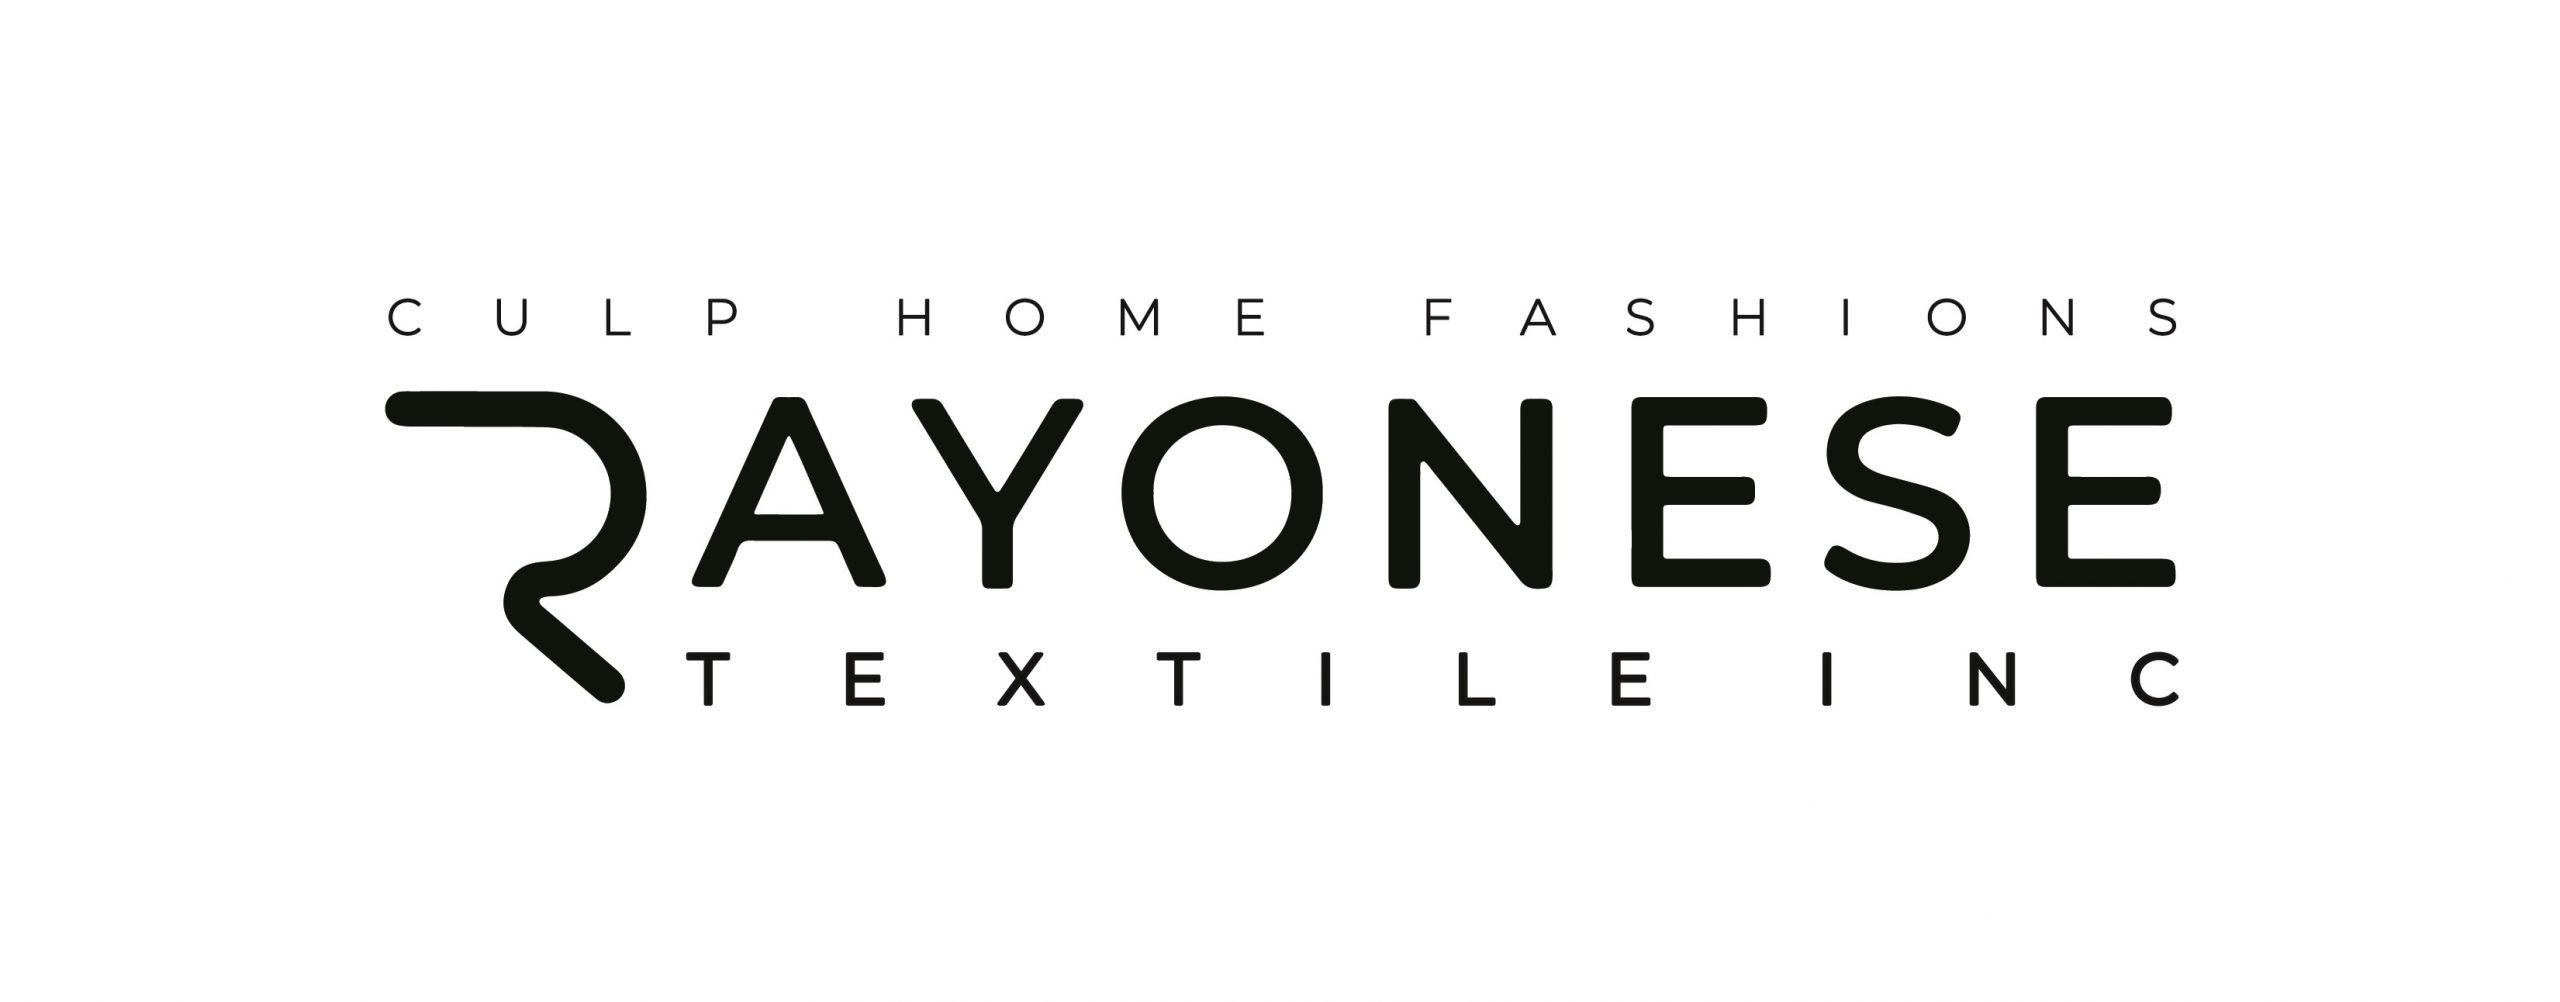 Rayonese Textile Inc.